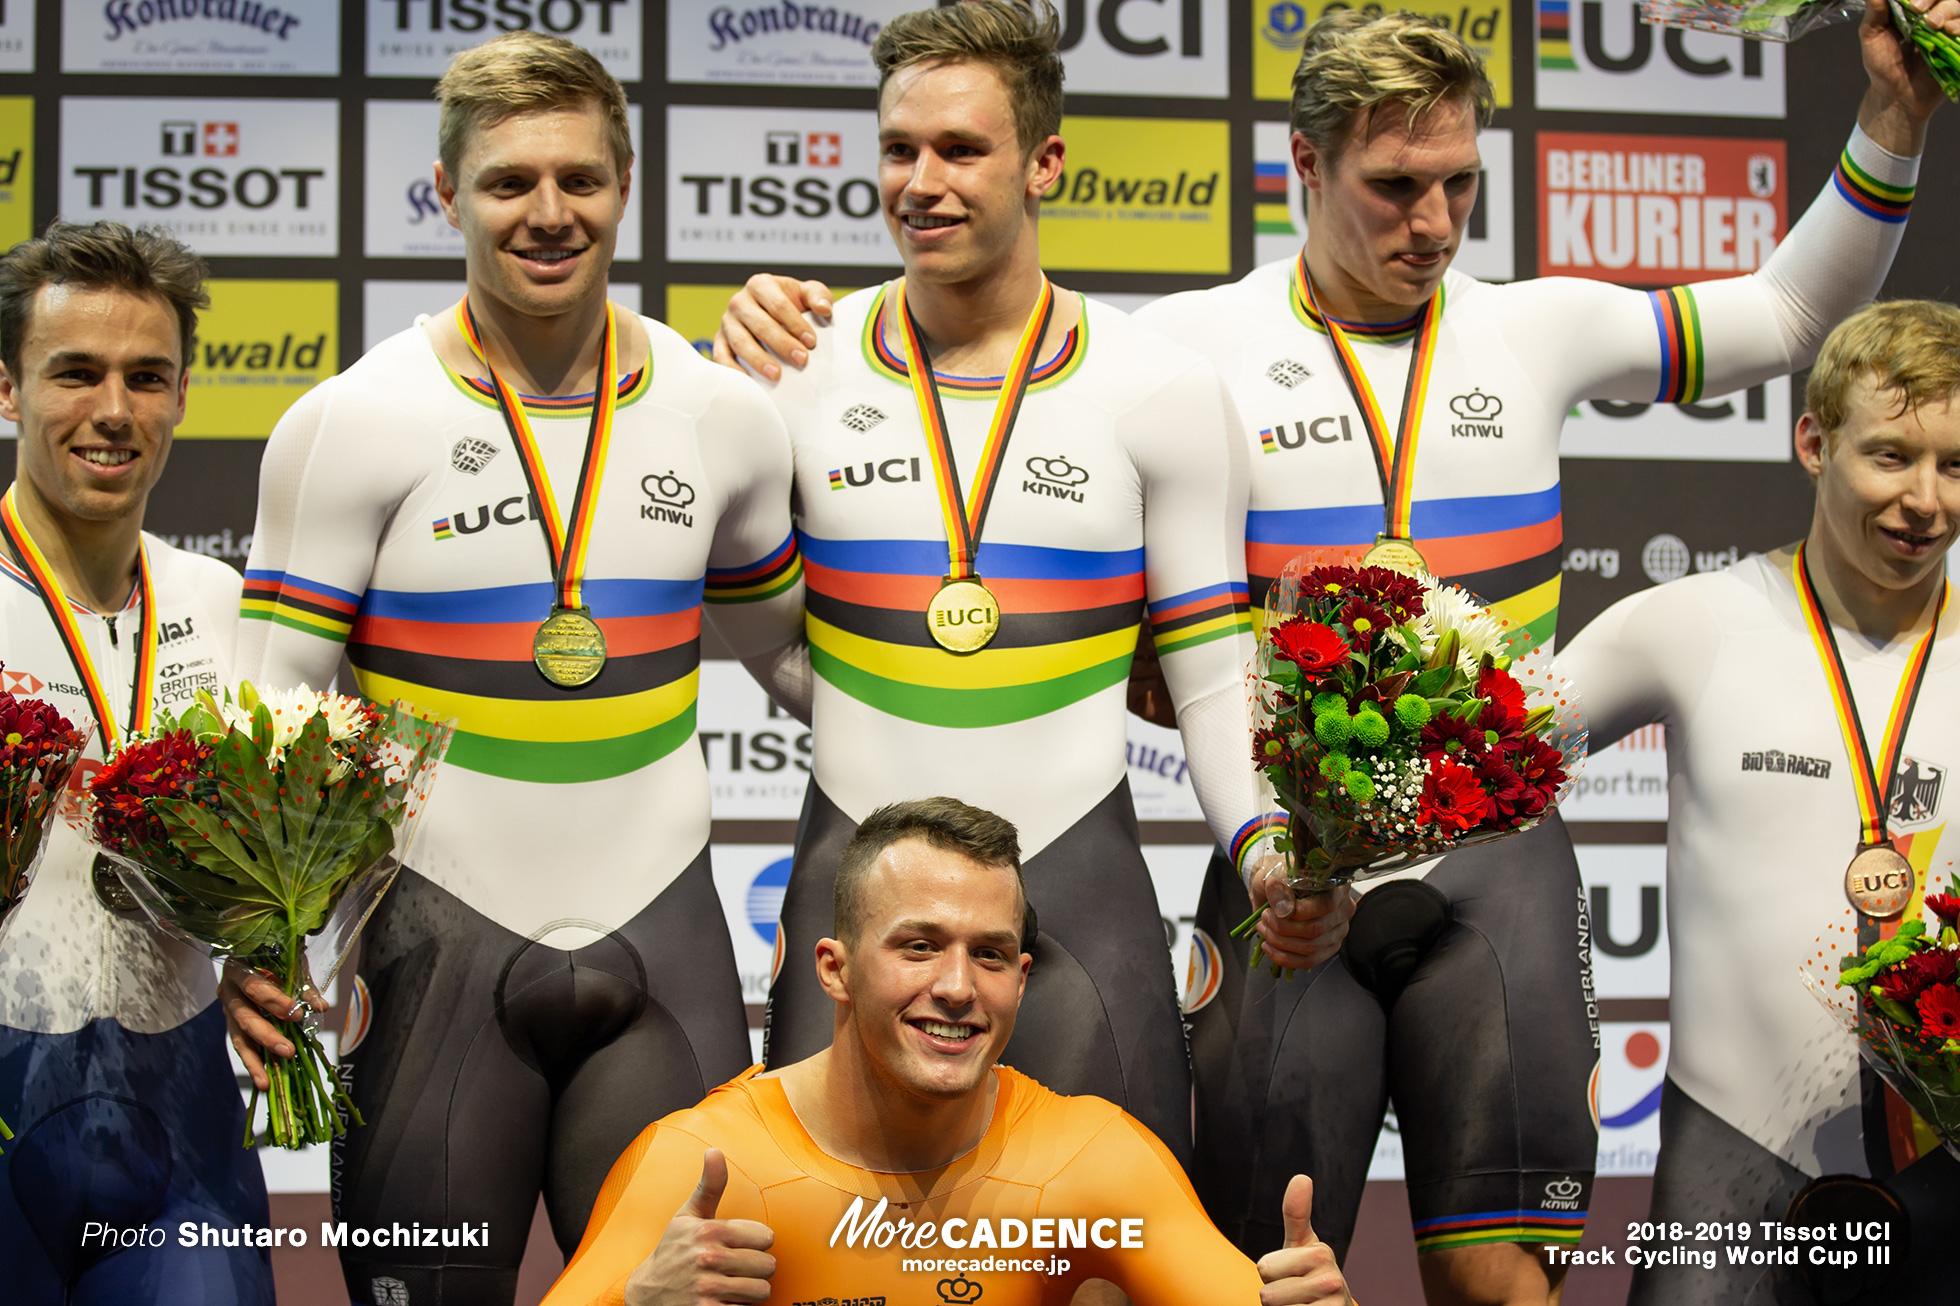 Netherland/Men's Team Sprint/2018-2019 Track Cycling World Cup III Berlin